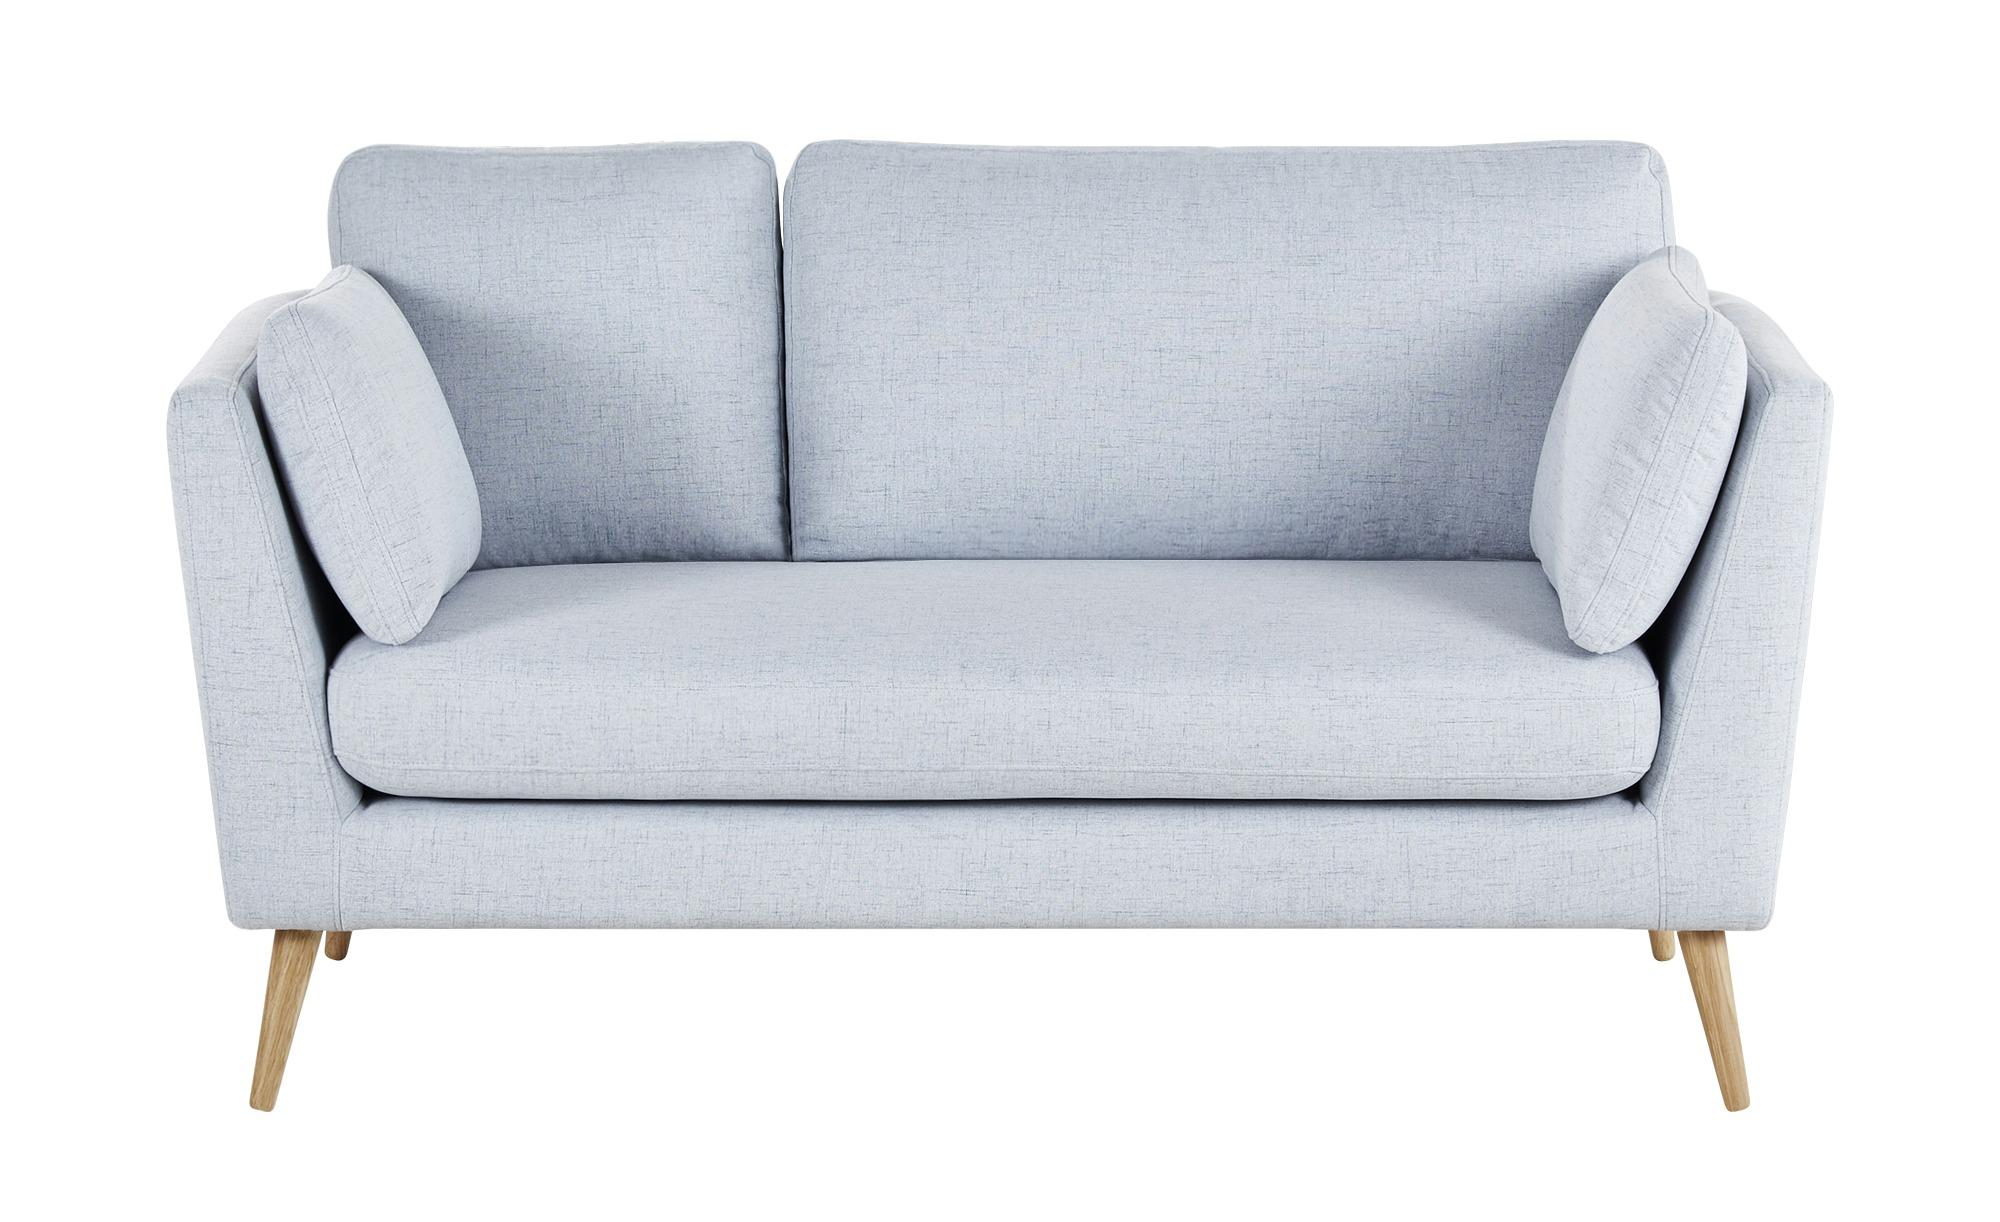 finya Skandi-Sofa graublau - Webstoff Jane ¦ blau ¦ Maße (cm): B: 162 H: 92 T: 88 Polstermöbel > Sofas > 2-Sitzer - Höffner